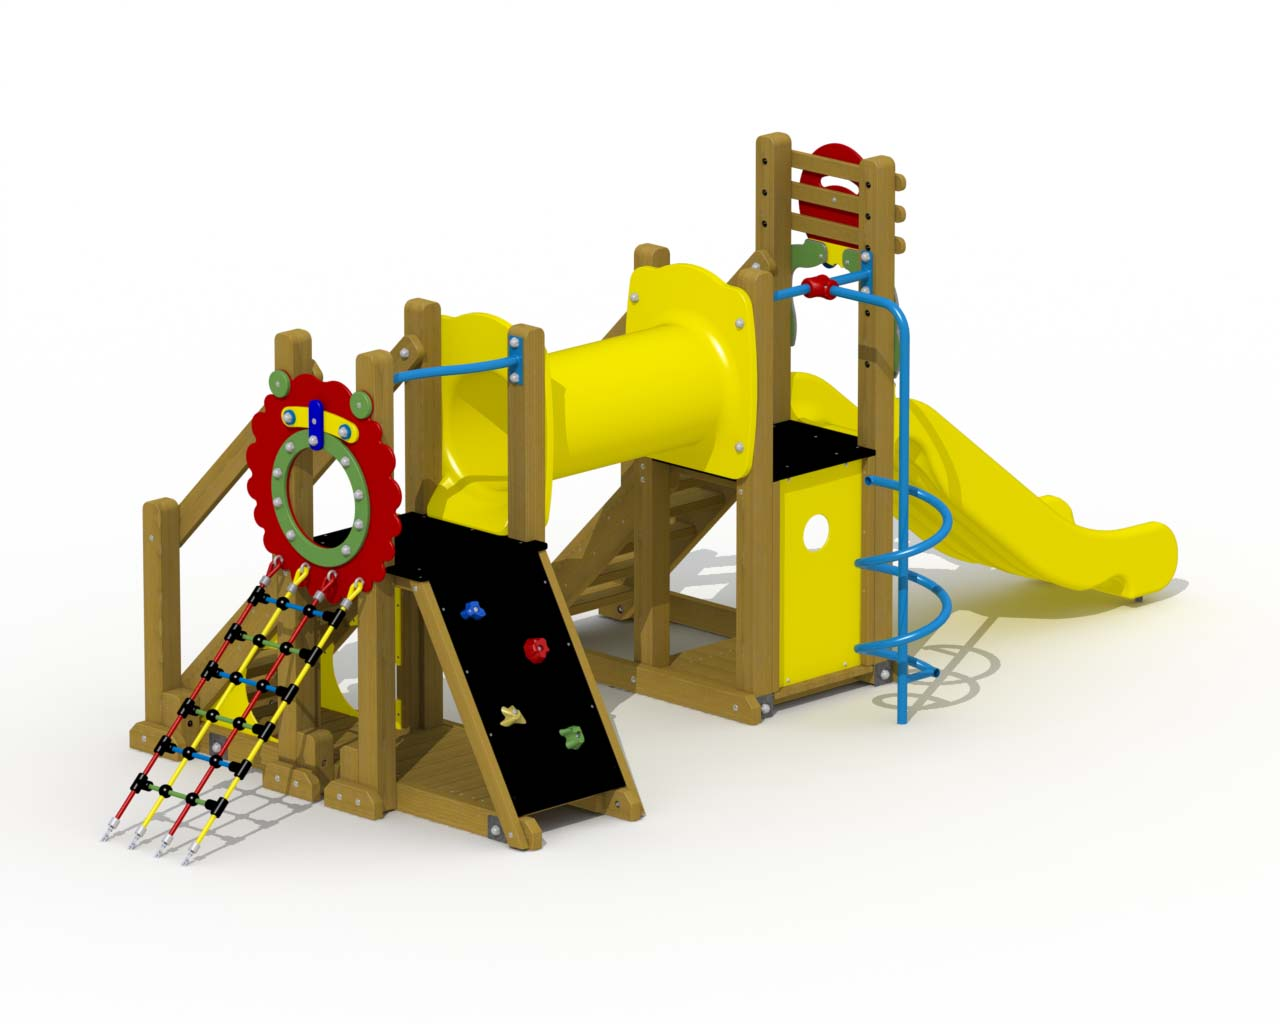 Mammoth (polymer Slide, Crawl Tunnel, Spiral Fireman's Pole)